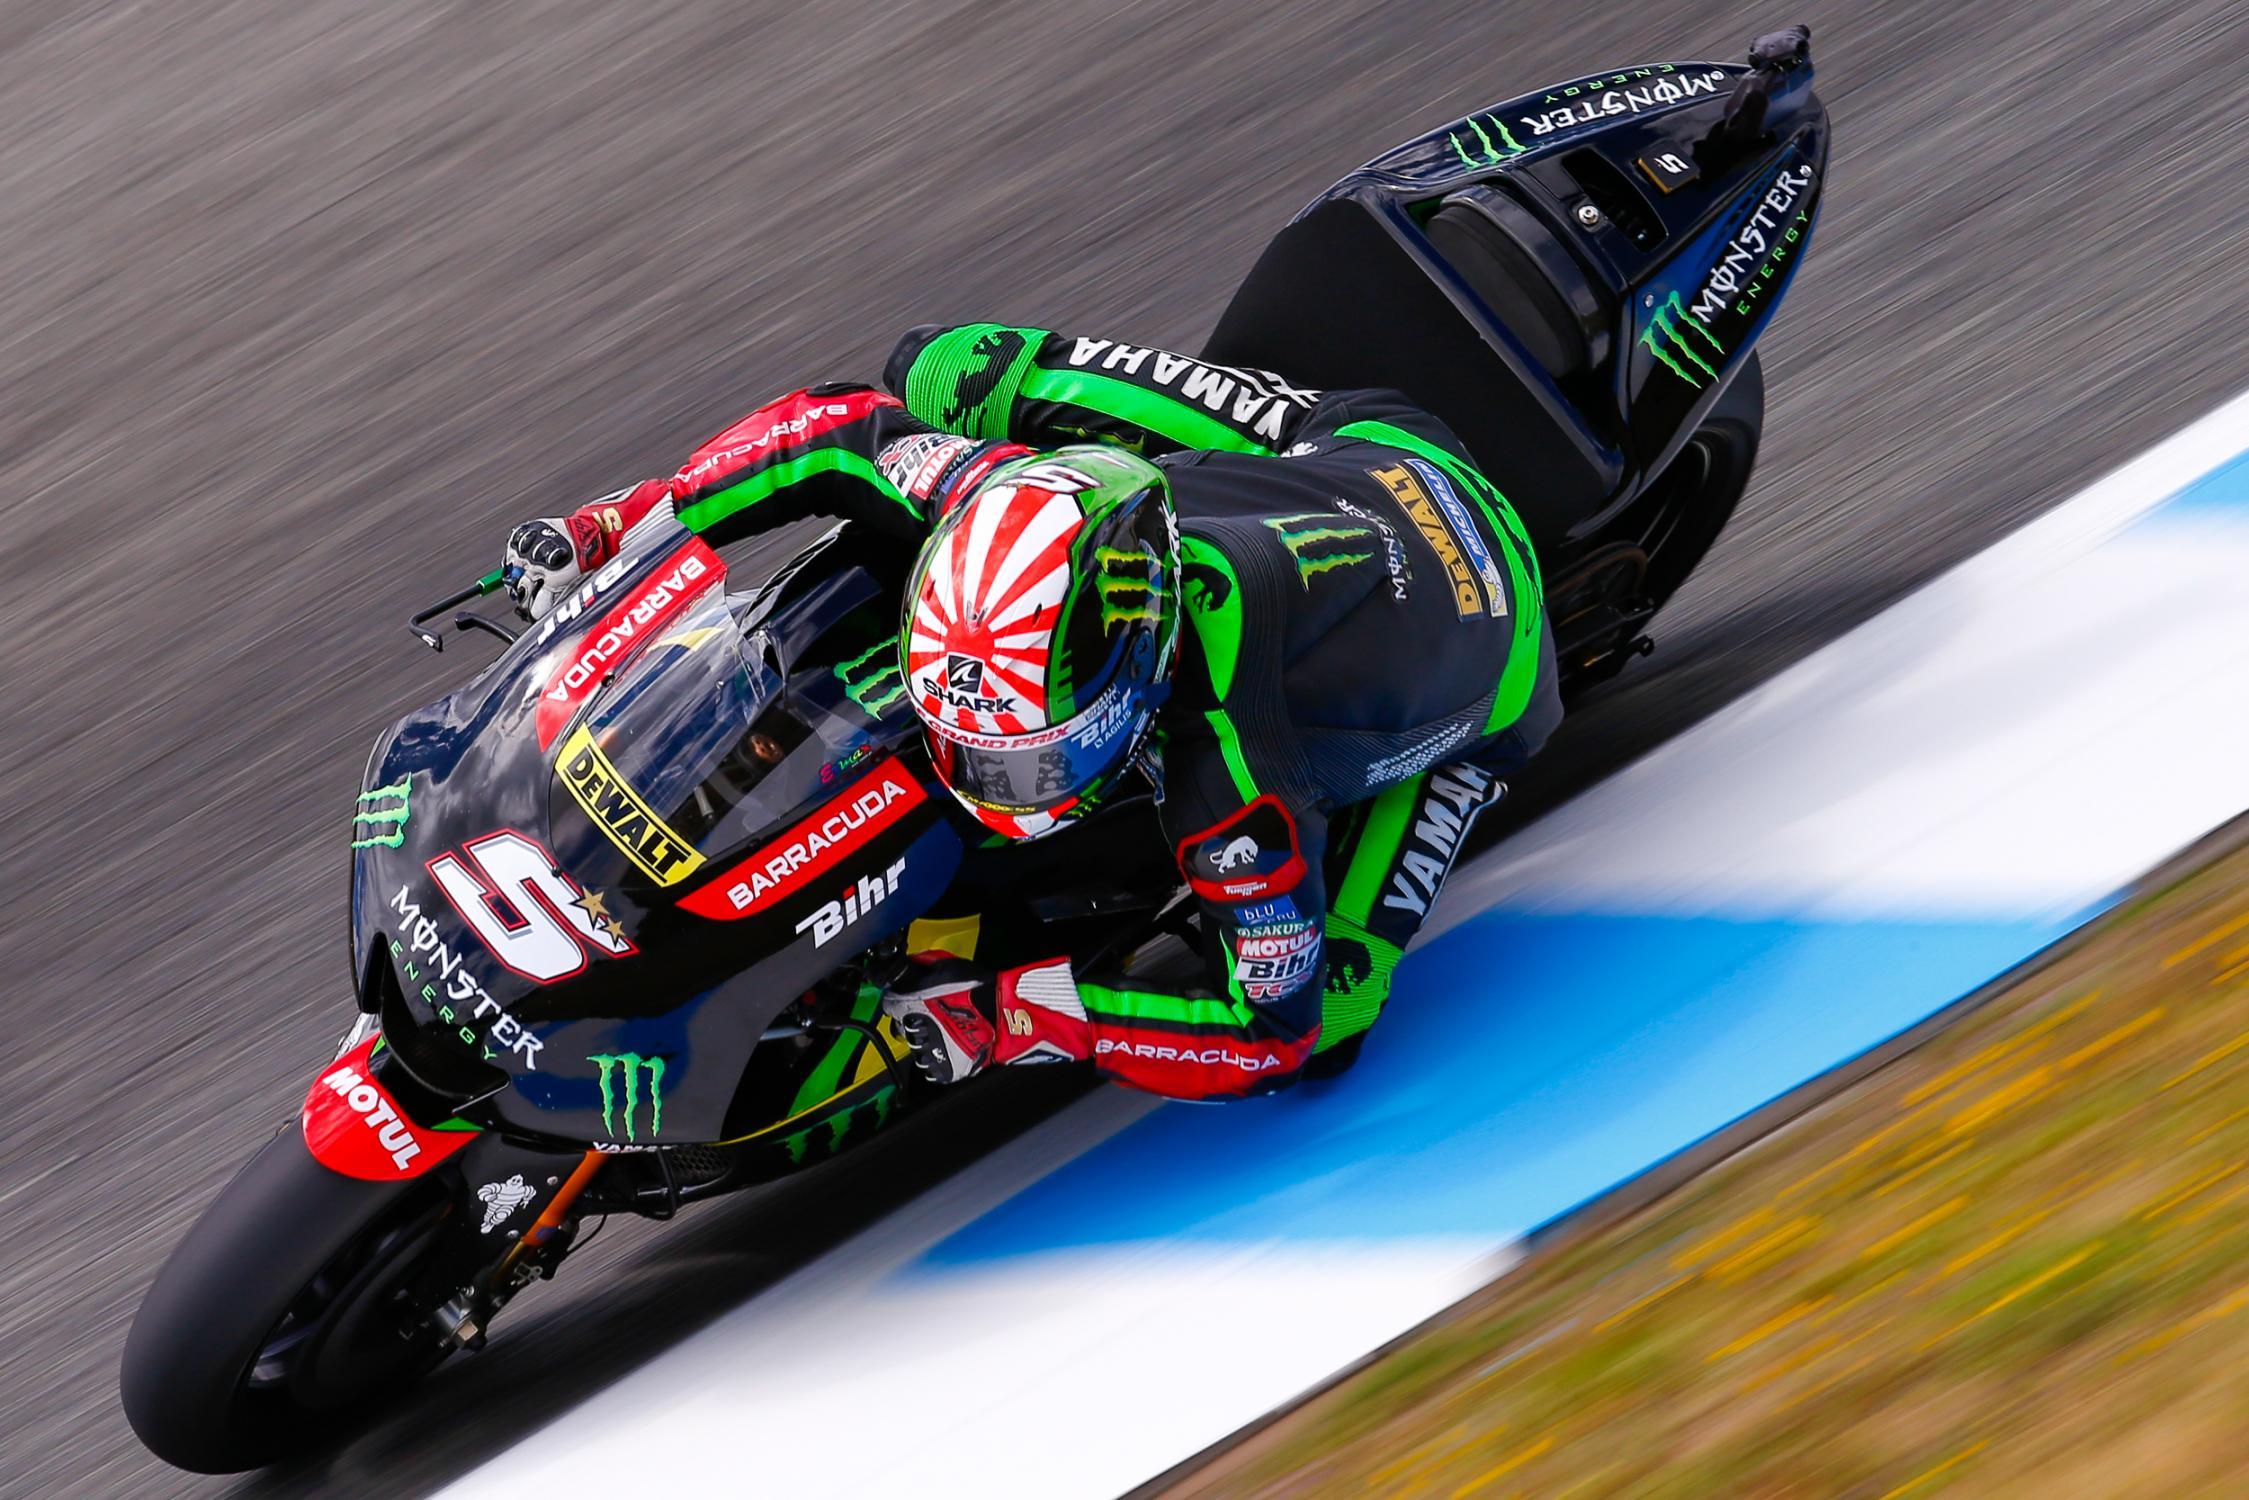 [GP] Jerez 05-johann-zarco-fra05340_gpjerez_motogp_action.gallery_full_top_fullscreen